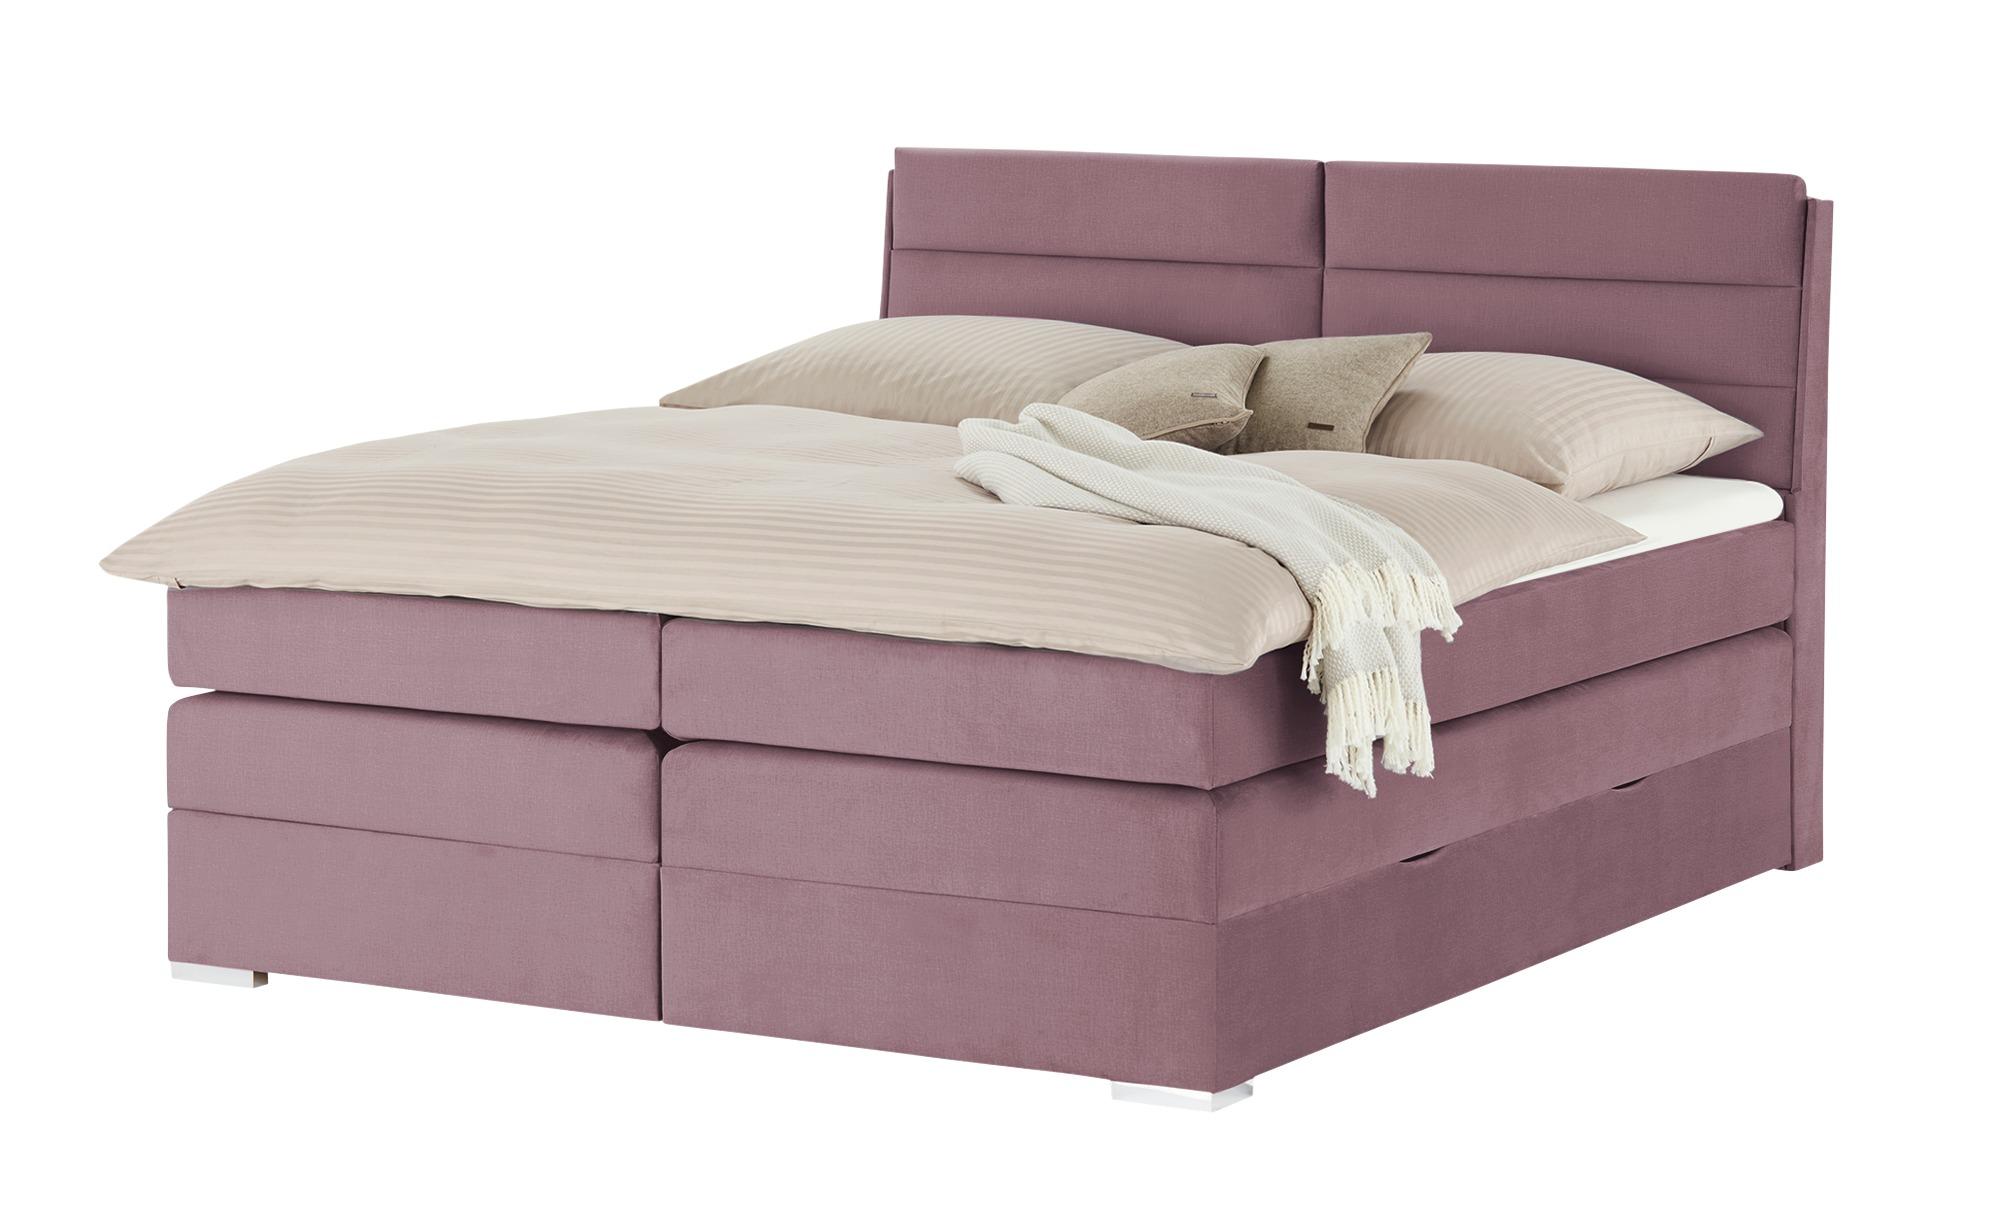 Boxspringbett  Wildgrave ¦ lila/violett ¦ Maße (cm): B: 162 H: 115 T: 217 Betten > Boxspringbetten > Boxspringbetten 160x200 - Höffner